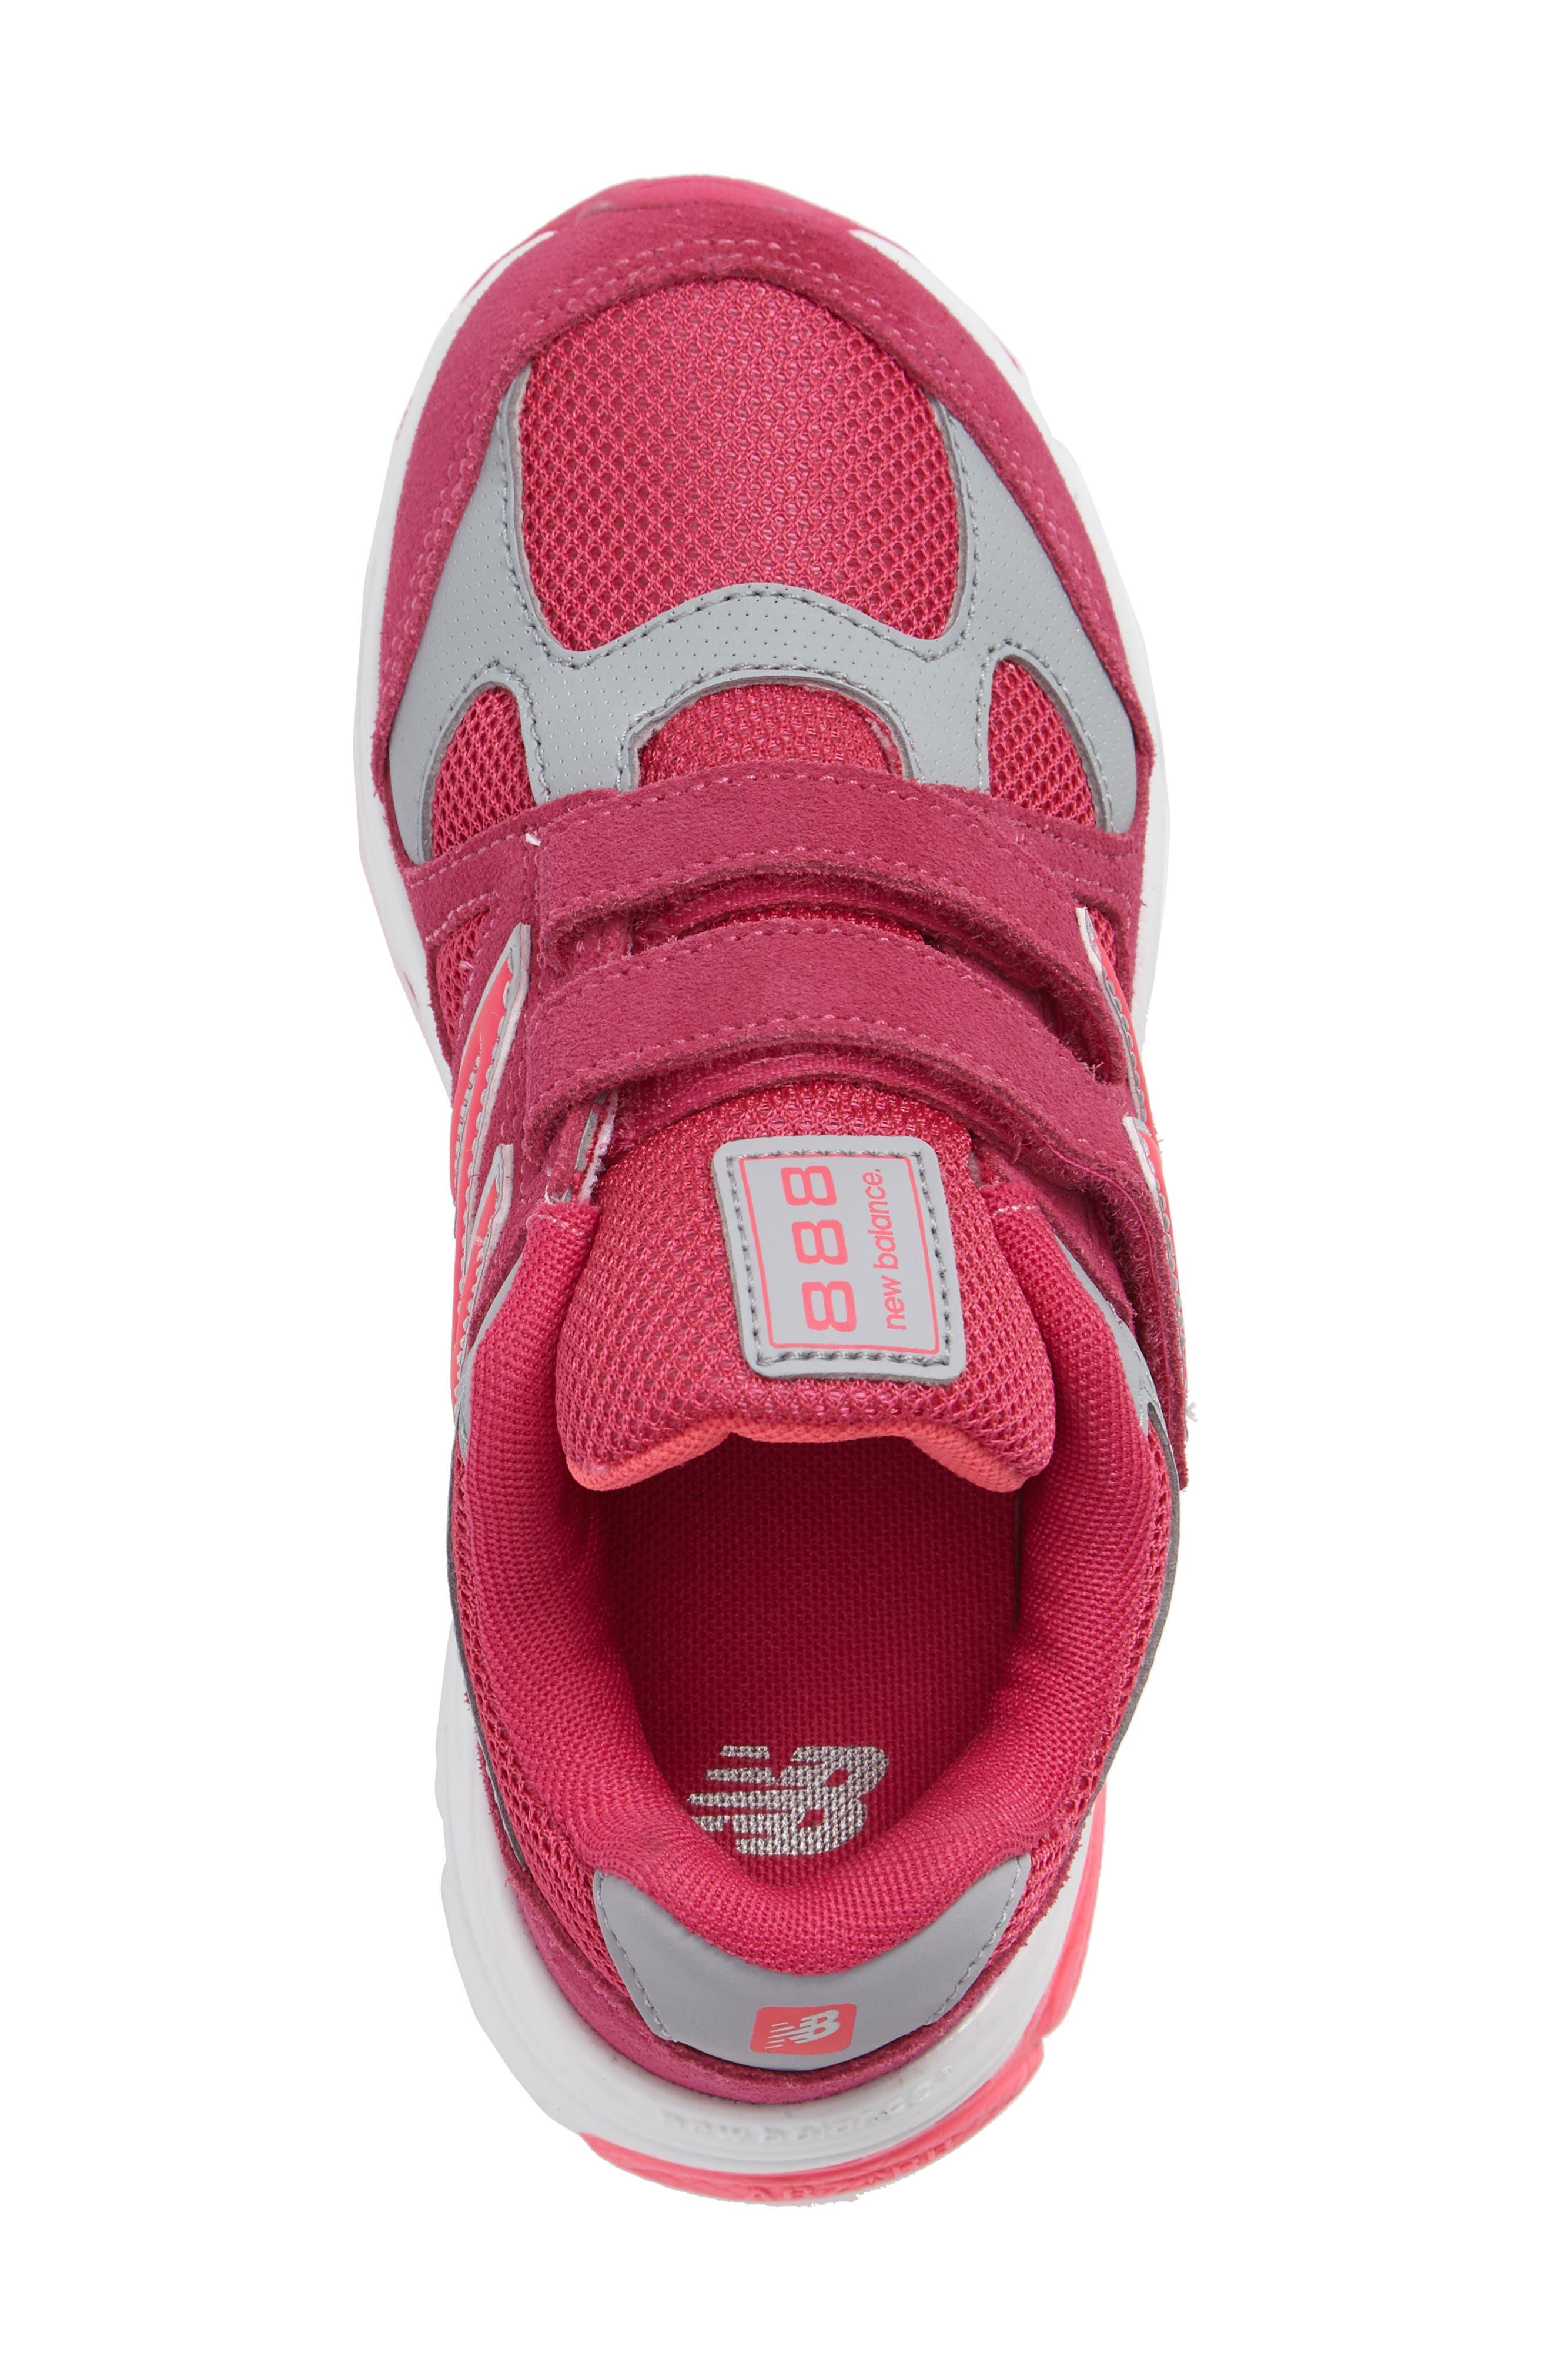 888 Sneaker,                             Alternate thumbnail 3, color,                             Pink/Grey